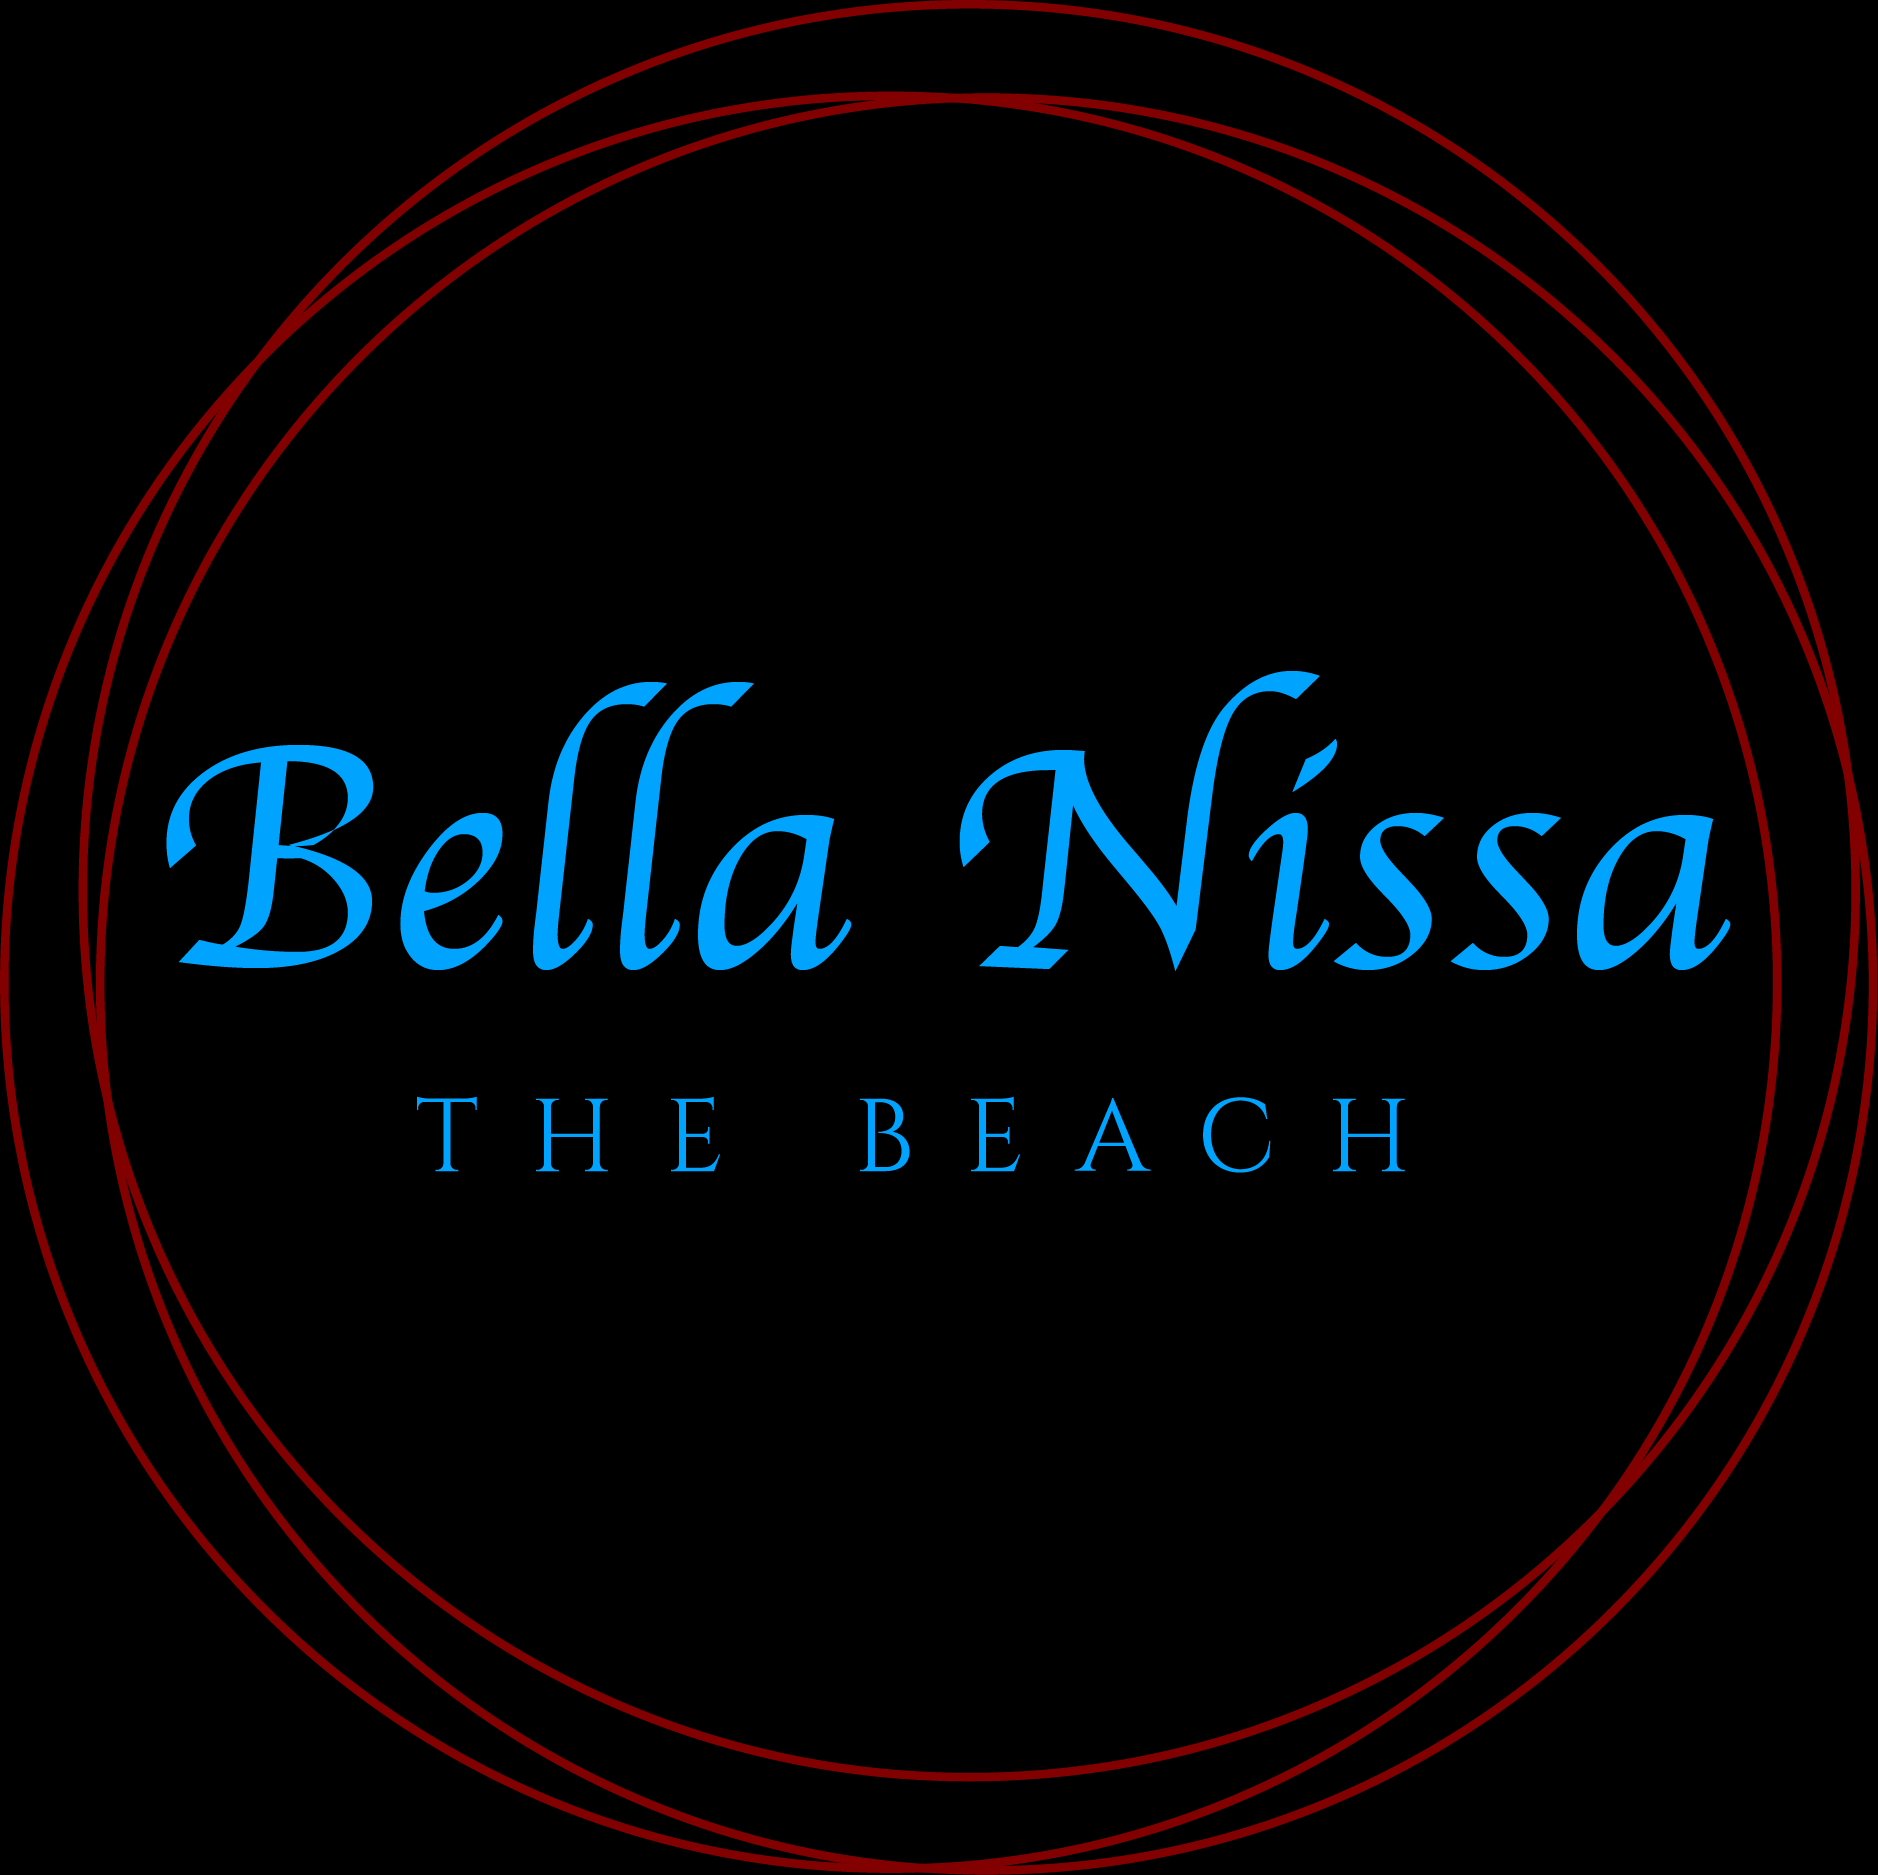 Bella Nissa Beach